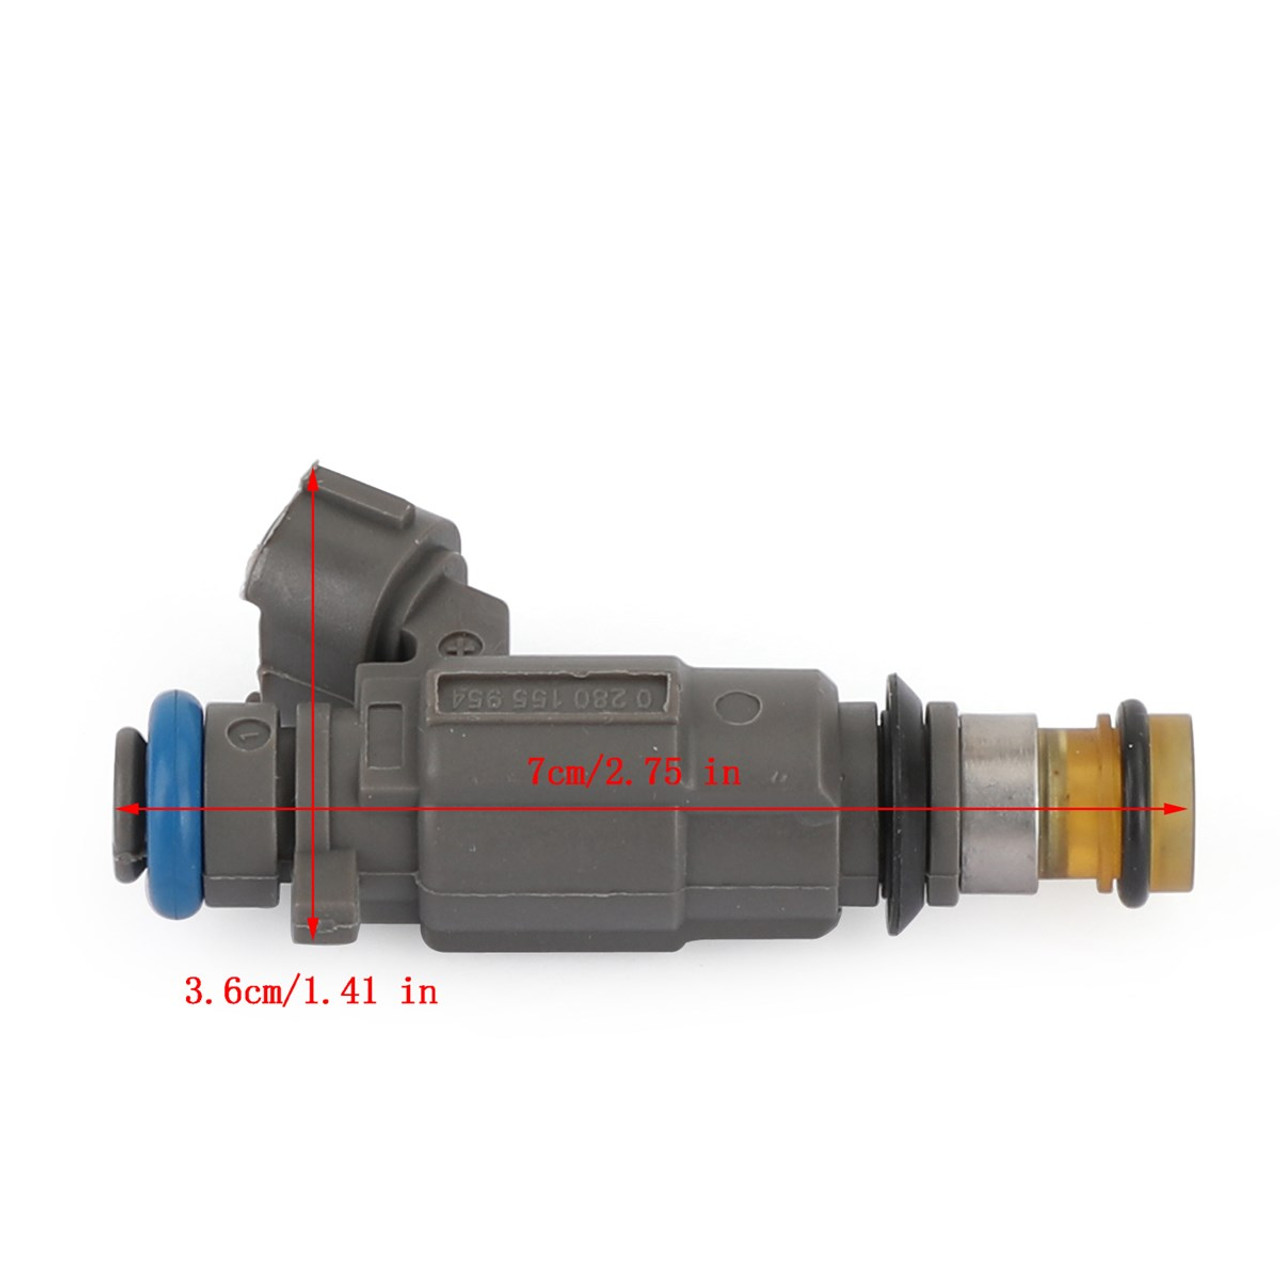 4PCS Fuel Injectors Fit For Subaru Baja 03-06 Legacy Outback 00-04 Brown FBLC-100 16611-AA43A